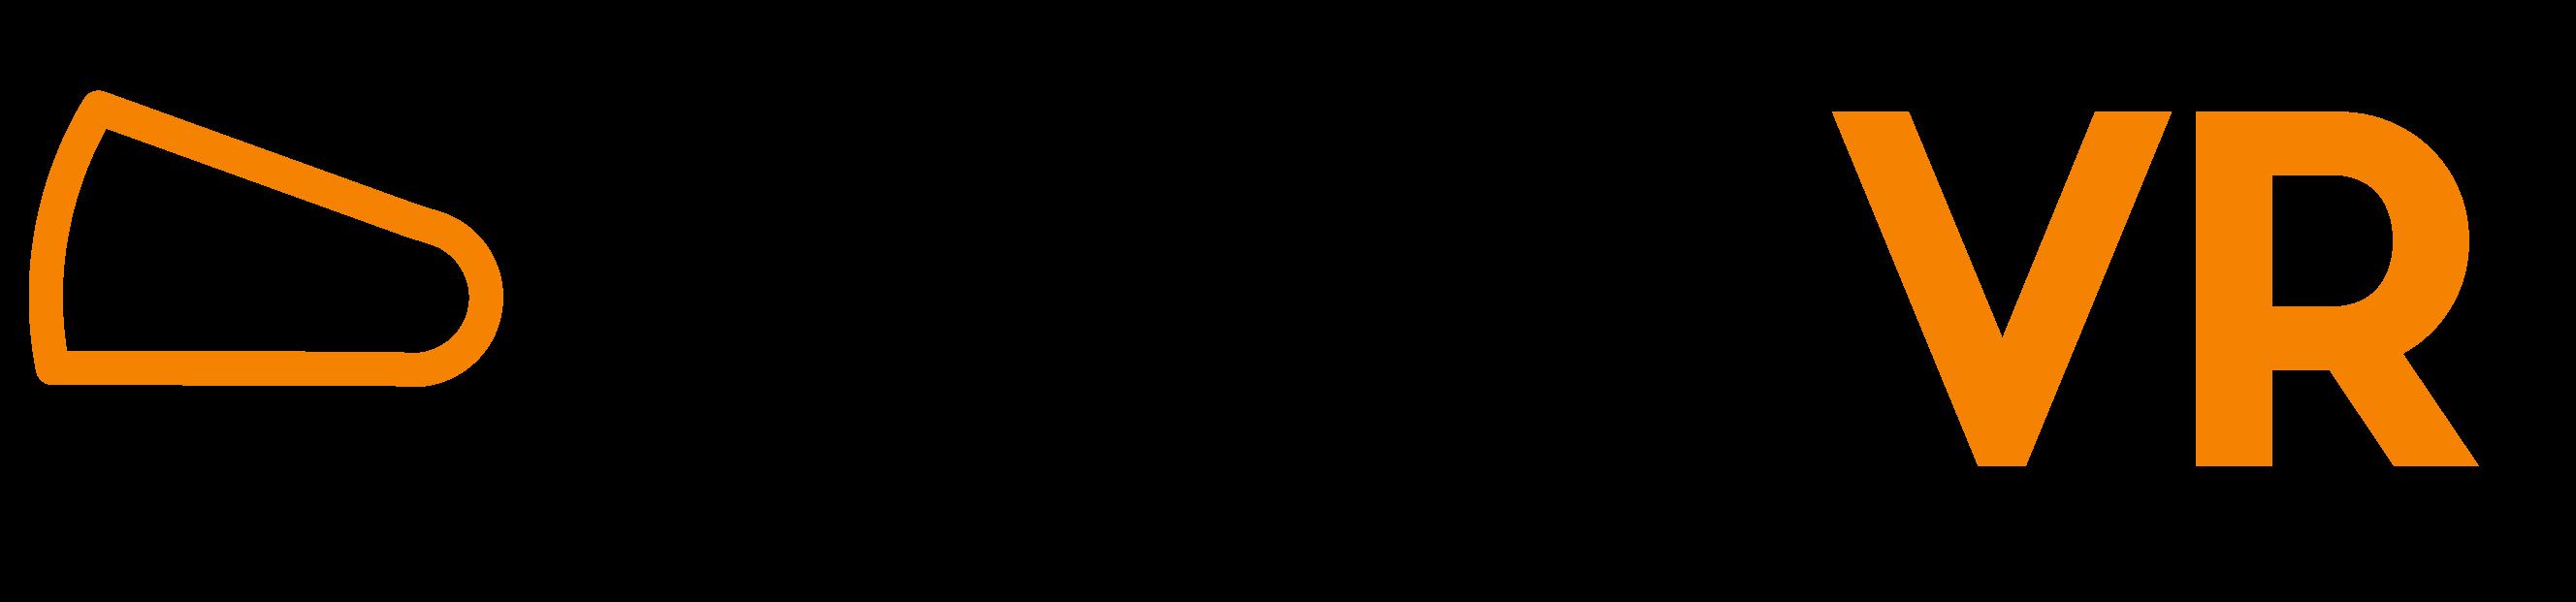 PIXOVR_Logo_Horizontal_ColorArtboard-1@4x-e1520965570370